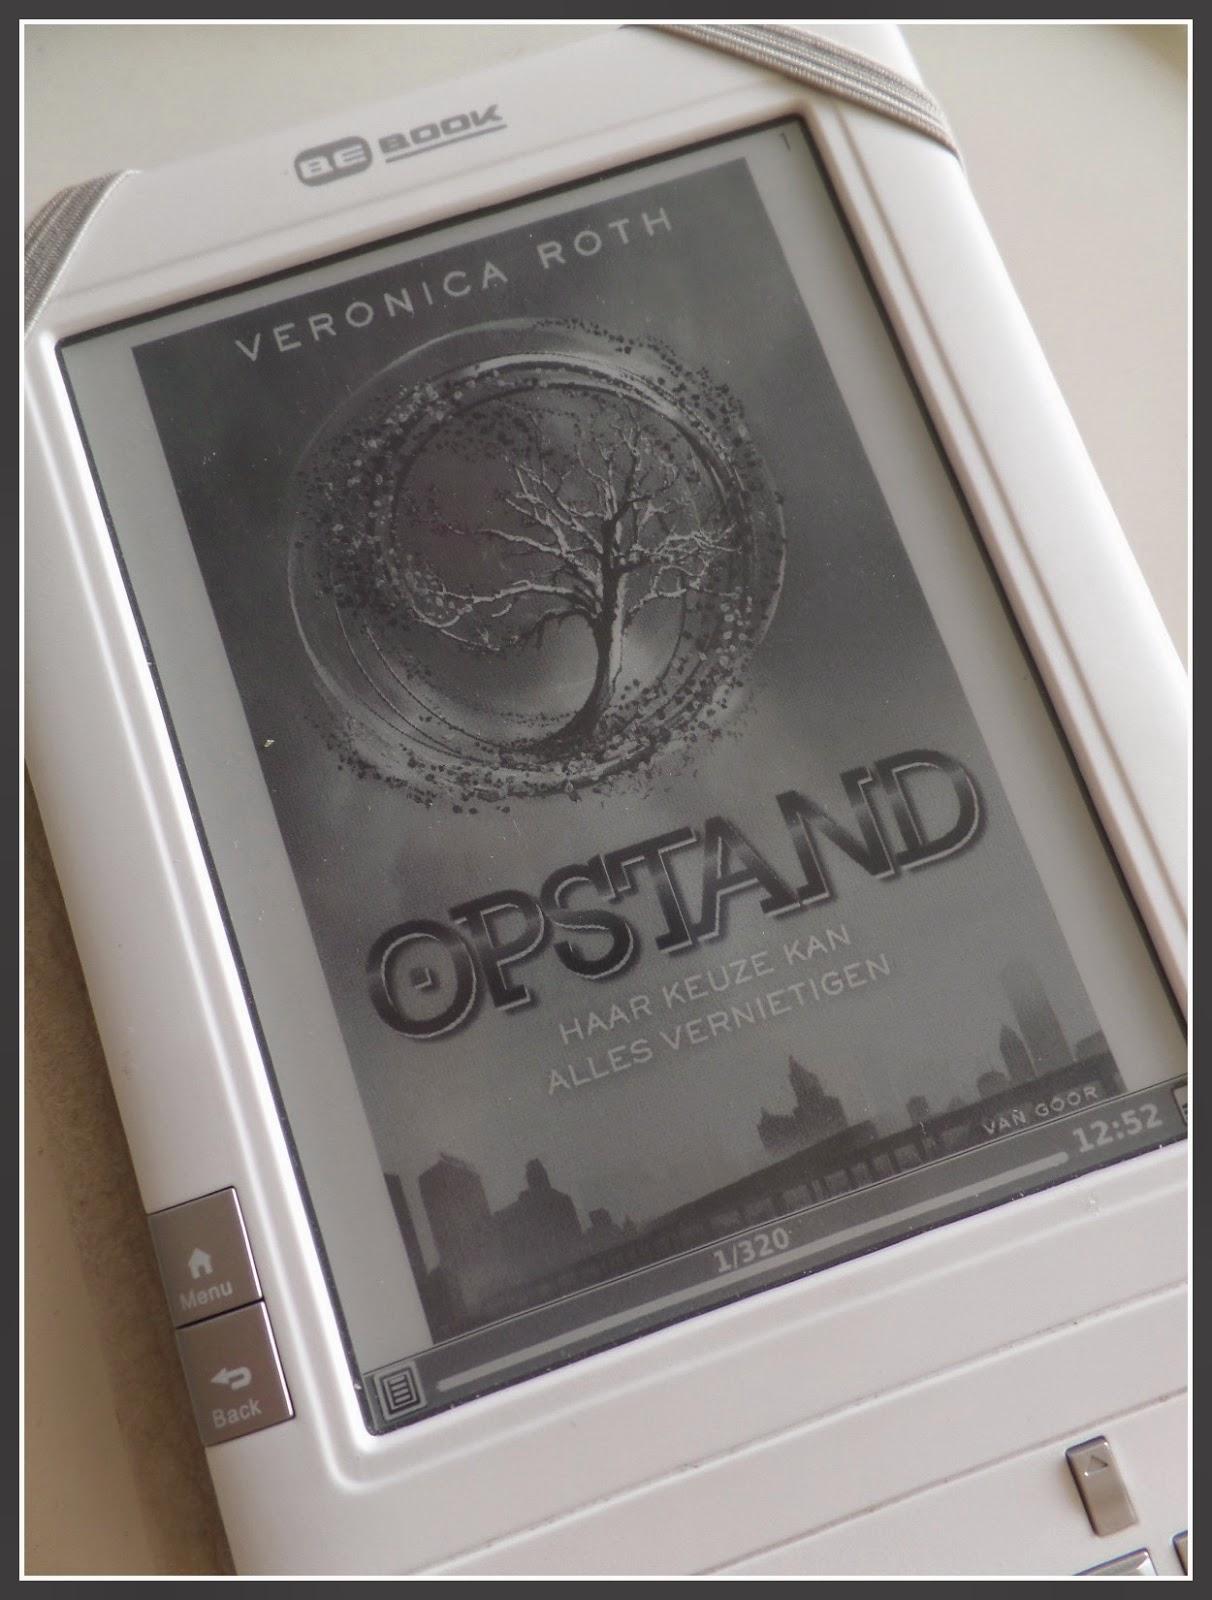 Boekrecensie - Veronica Roth - Opstand (Insurgent) #Books